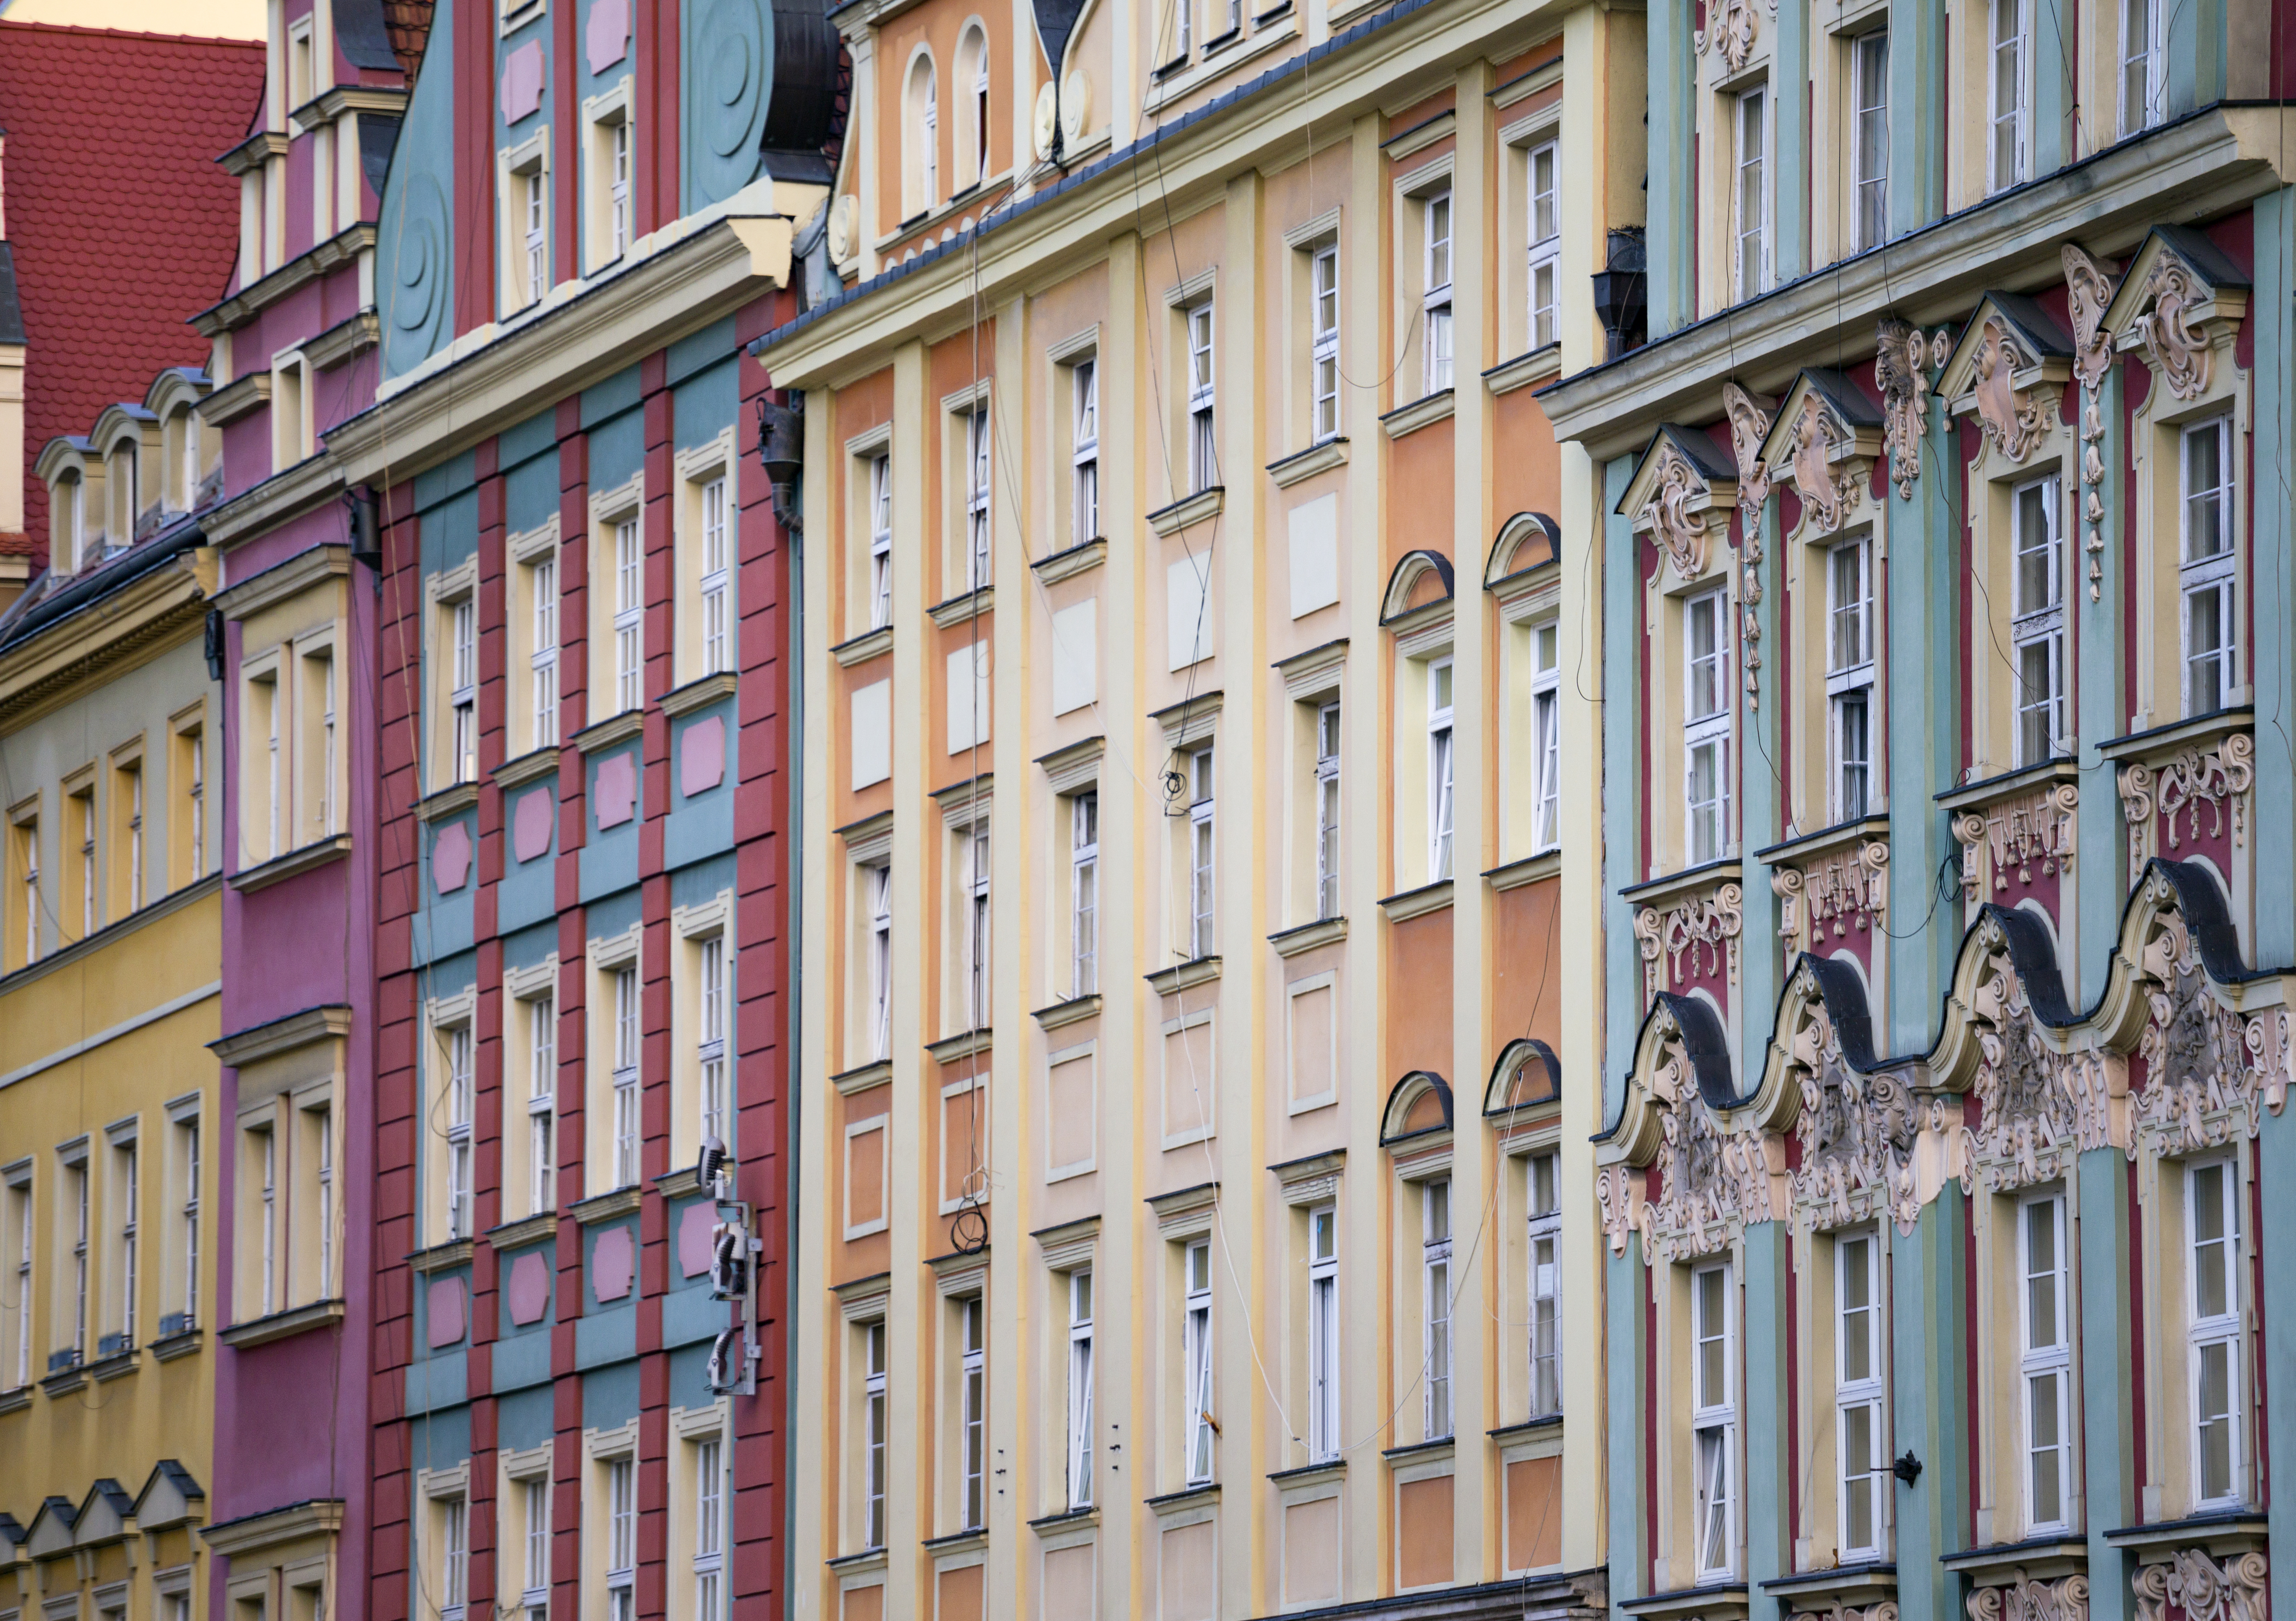 La Stary Rynek, el centro neurálgico de Poznan - Polonia Circuito Polonia, Lituania, Letonia y Estonia